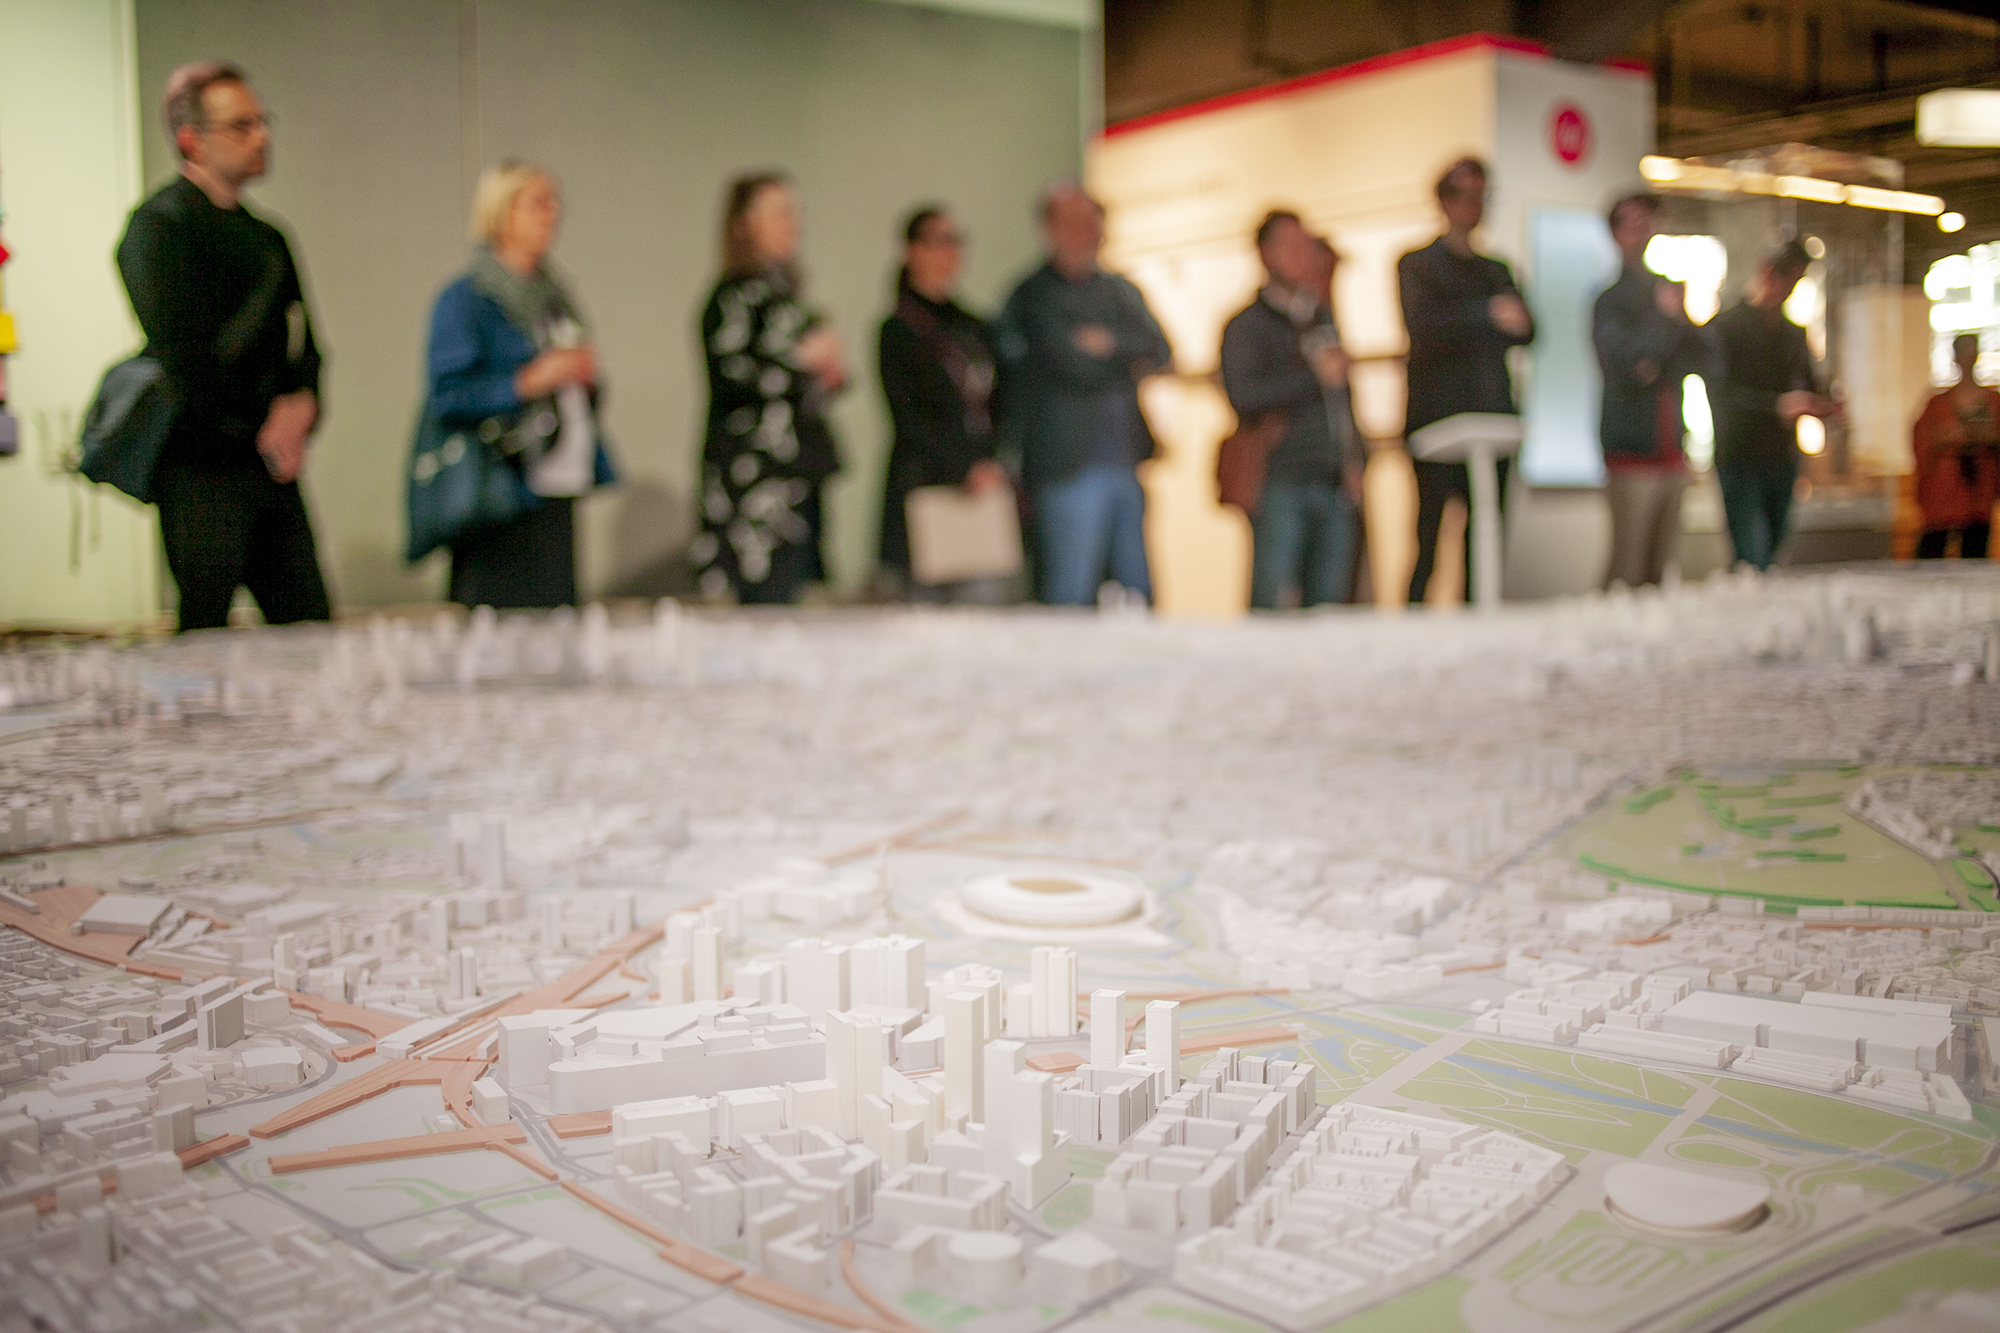 International Council, with Building Centre's model of London. Photo: Marina Piedade